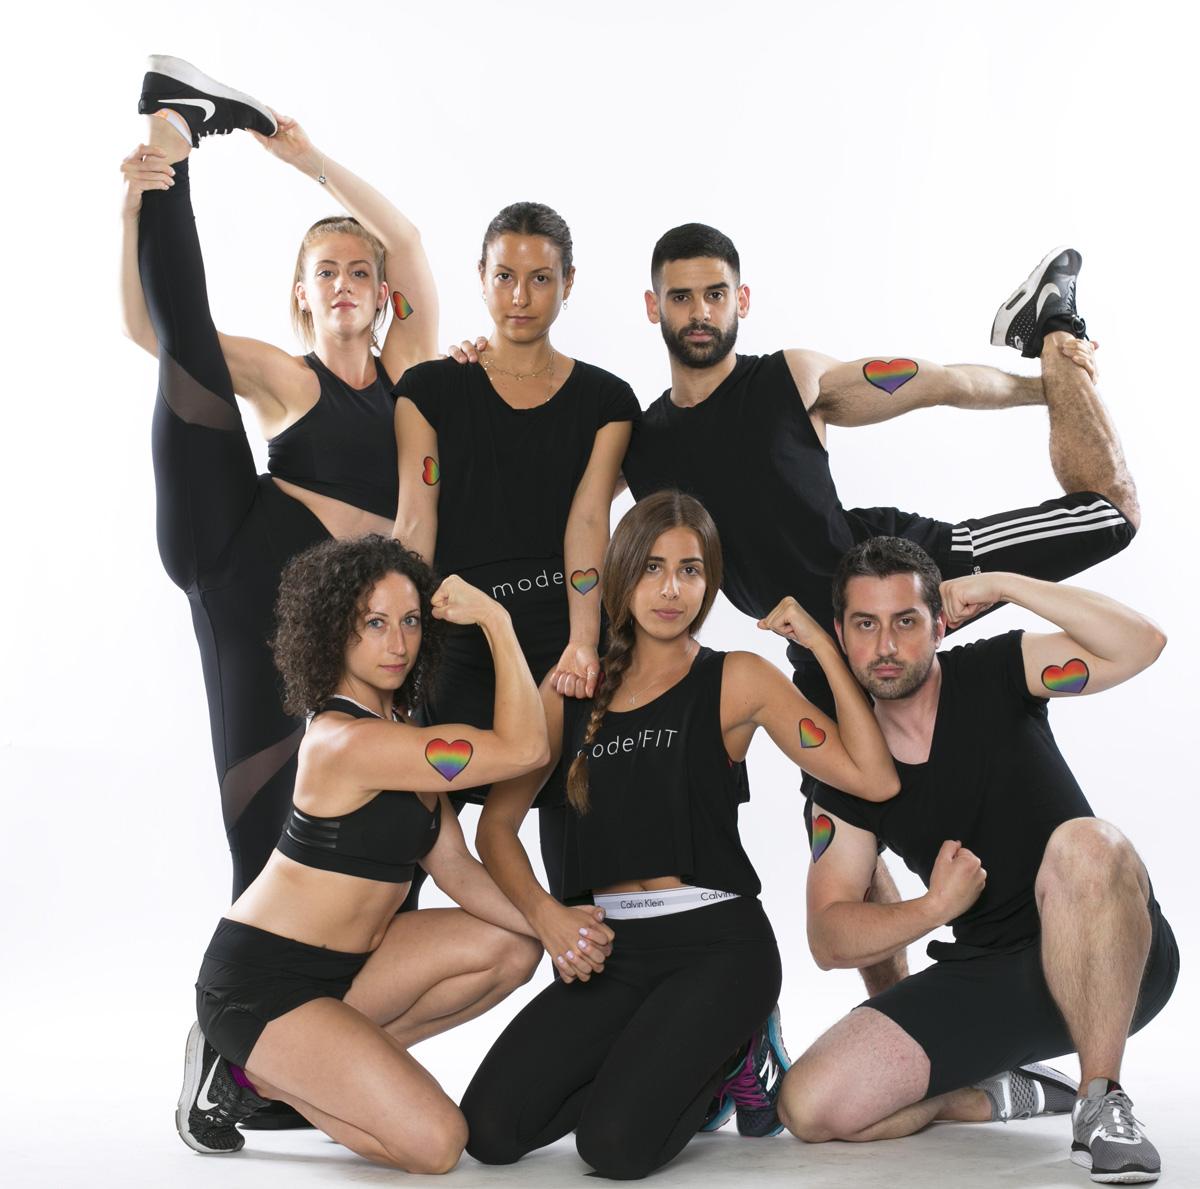 ModelFit Team